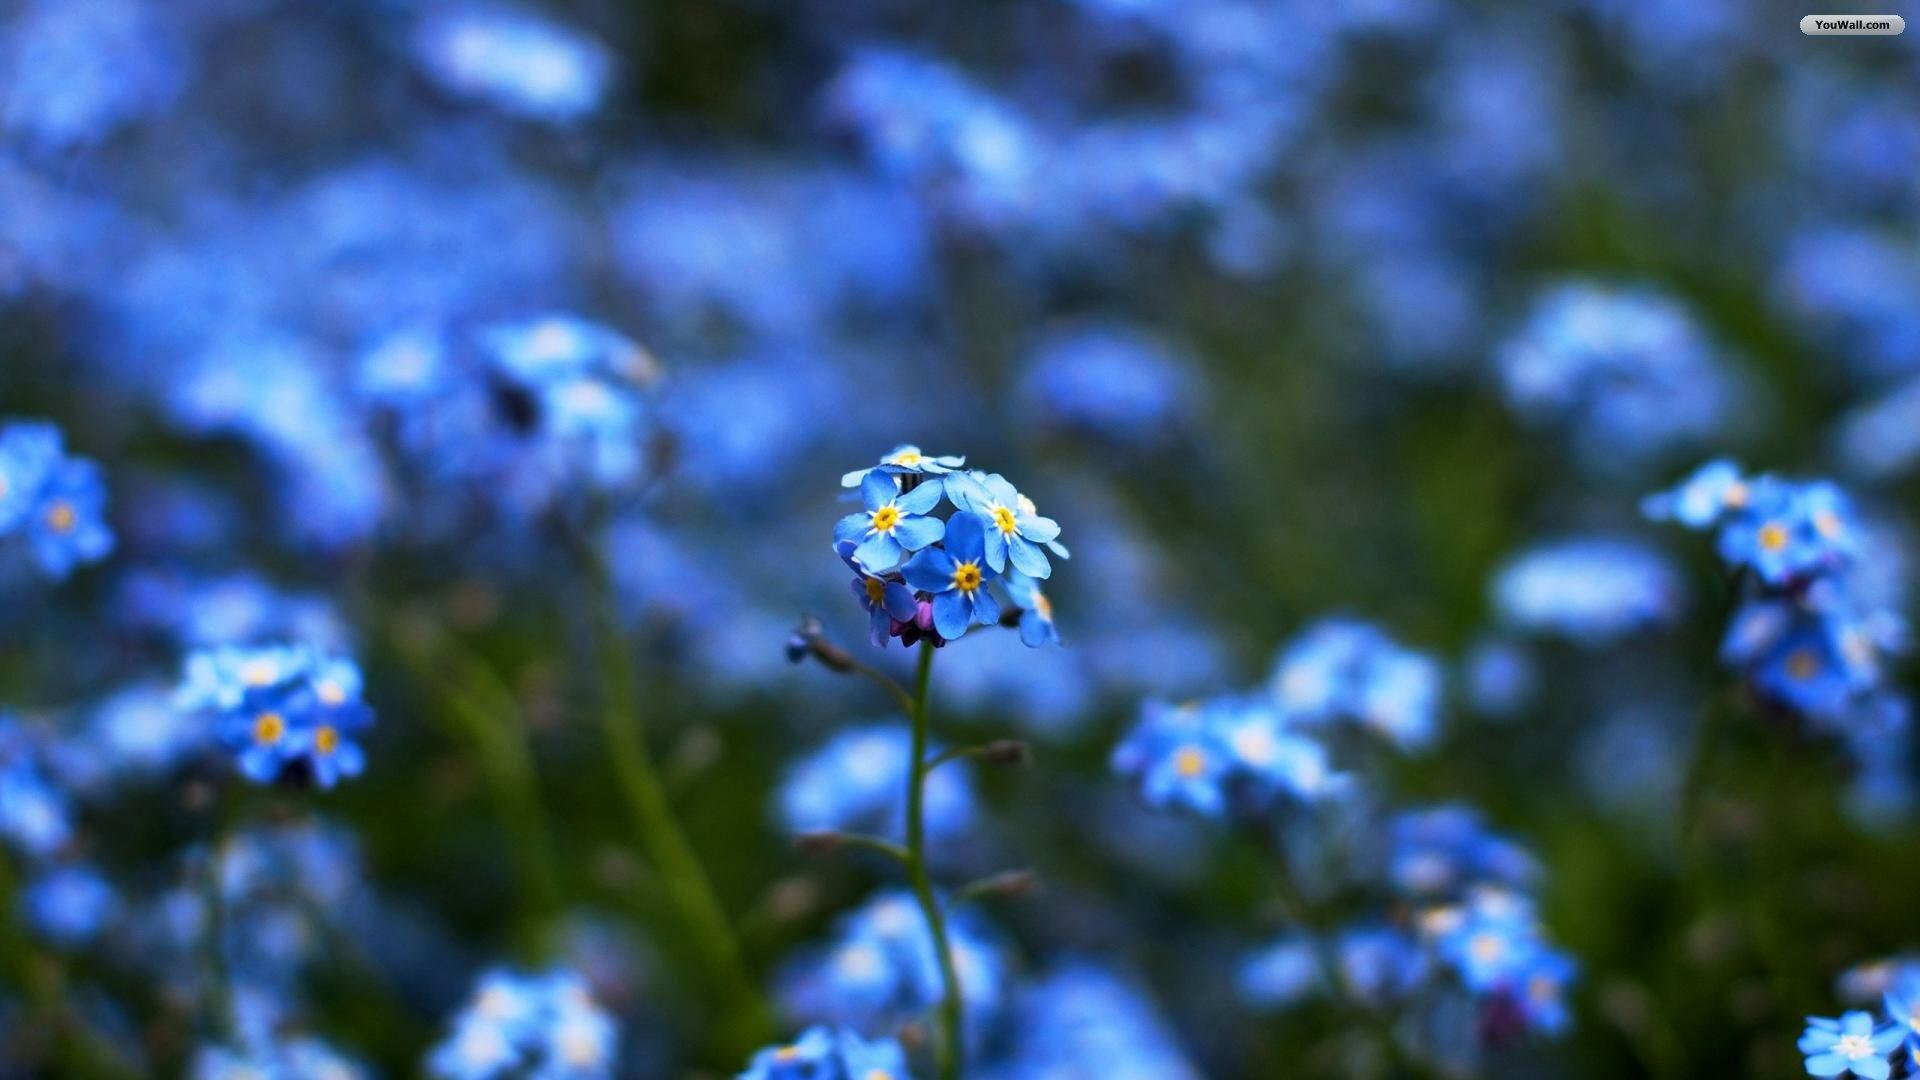 wallpapers flower flowers blue wallpaper 1920x1080 1920x1080